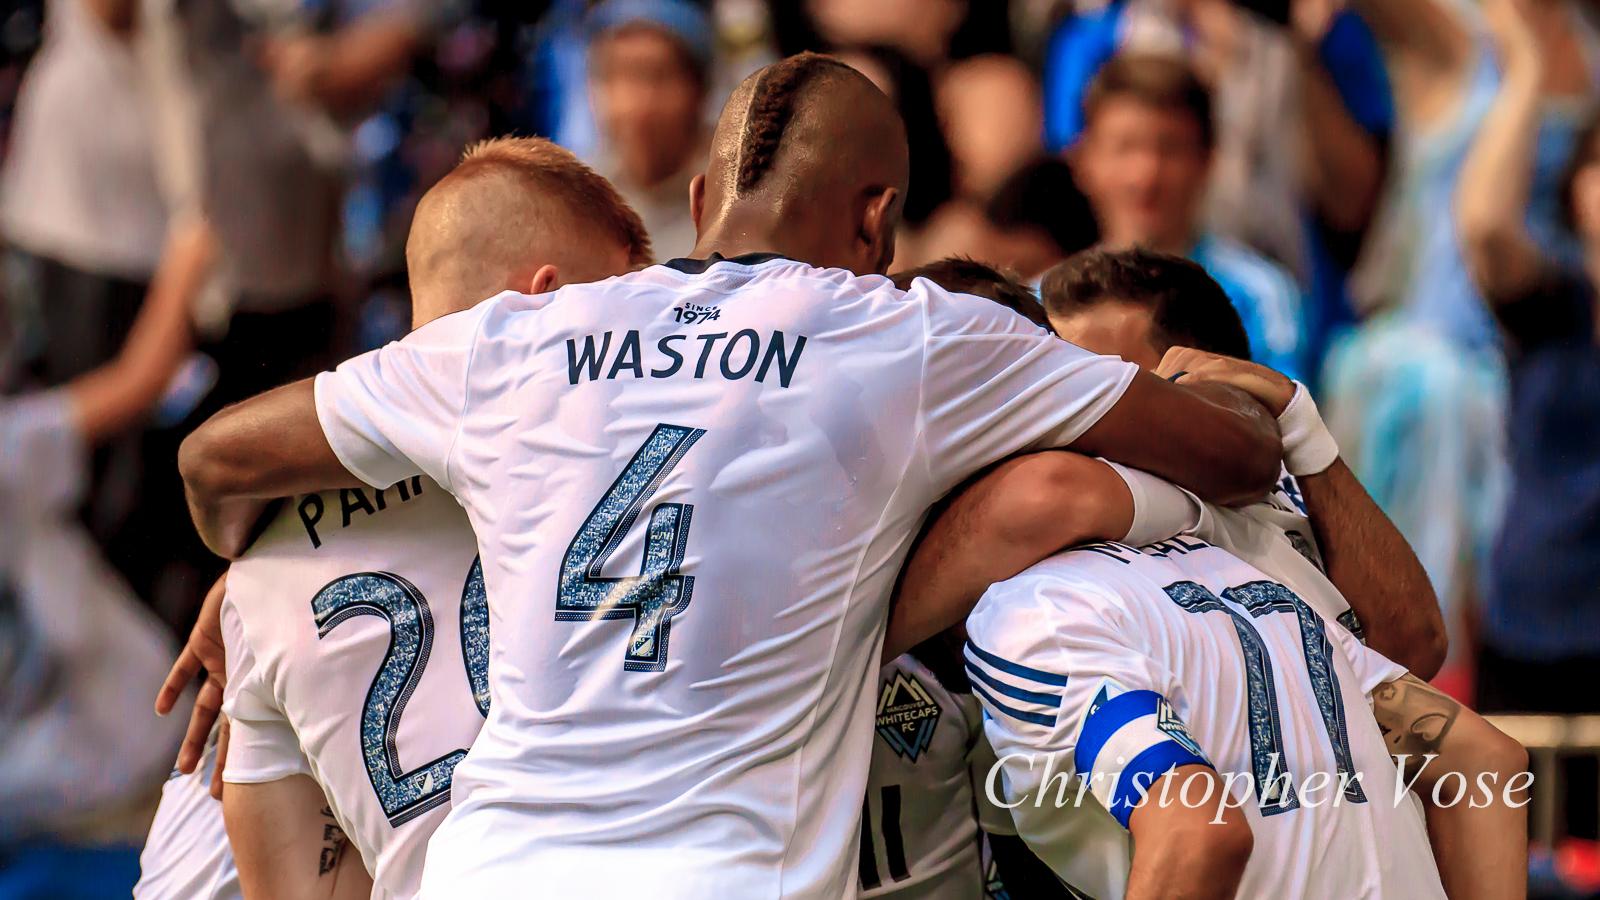 2015-08-22 Cristian Techera Goal Celebration 2.jpg